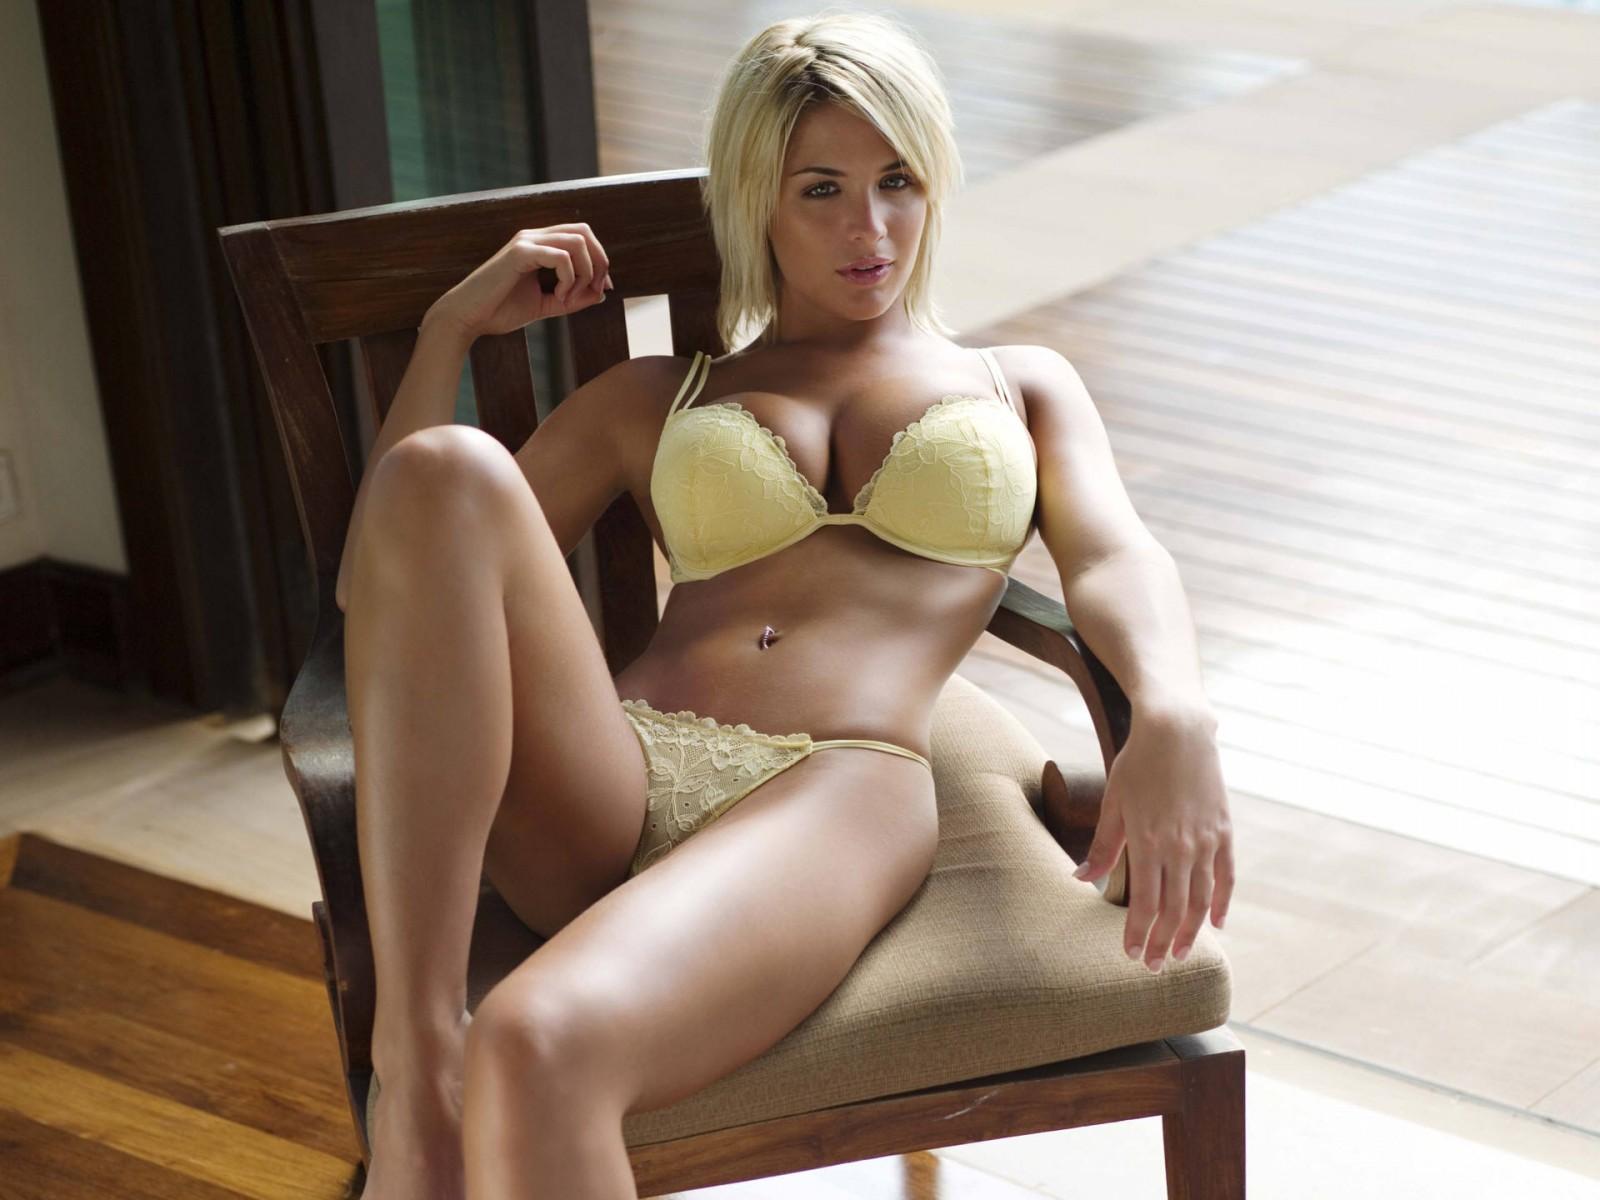 Красивый секс онлайн по категориям мне